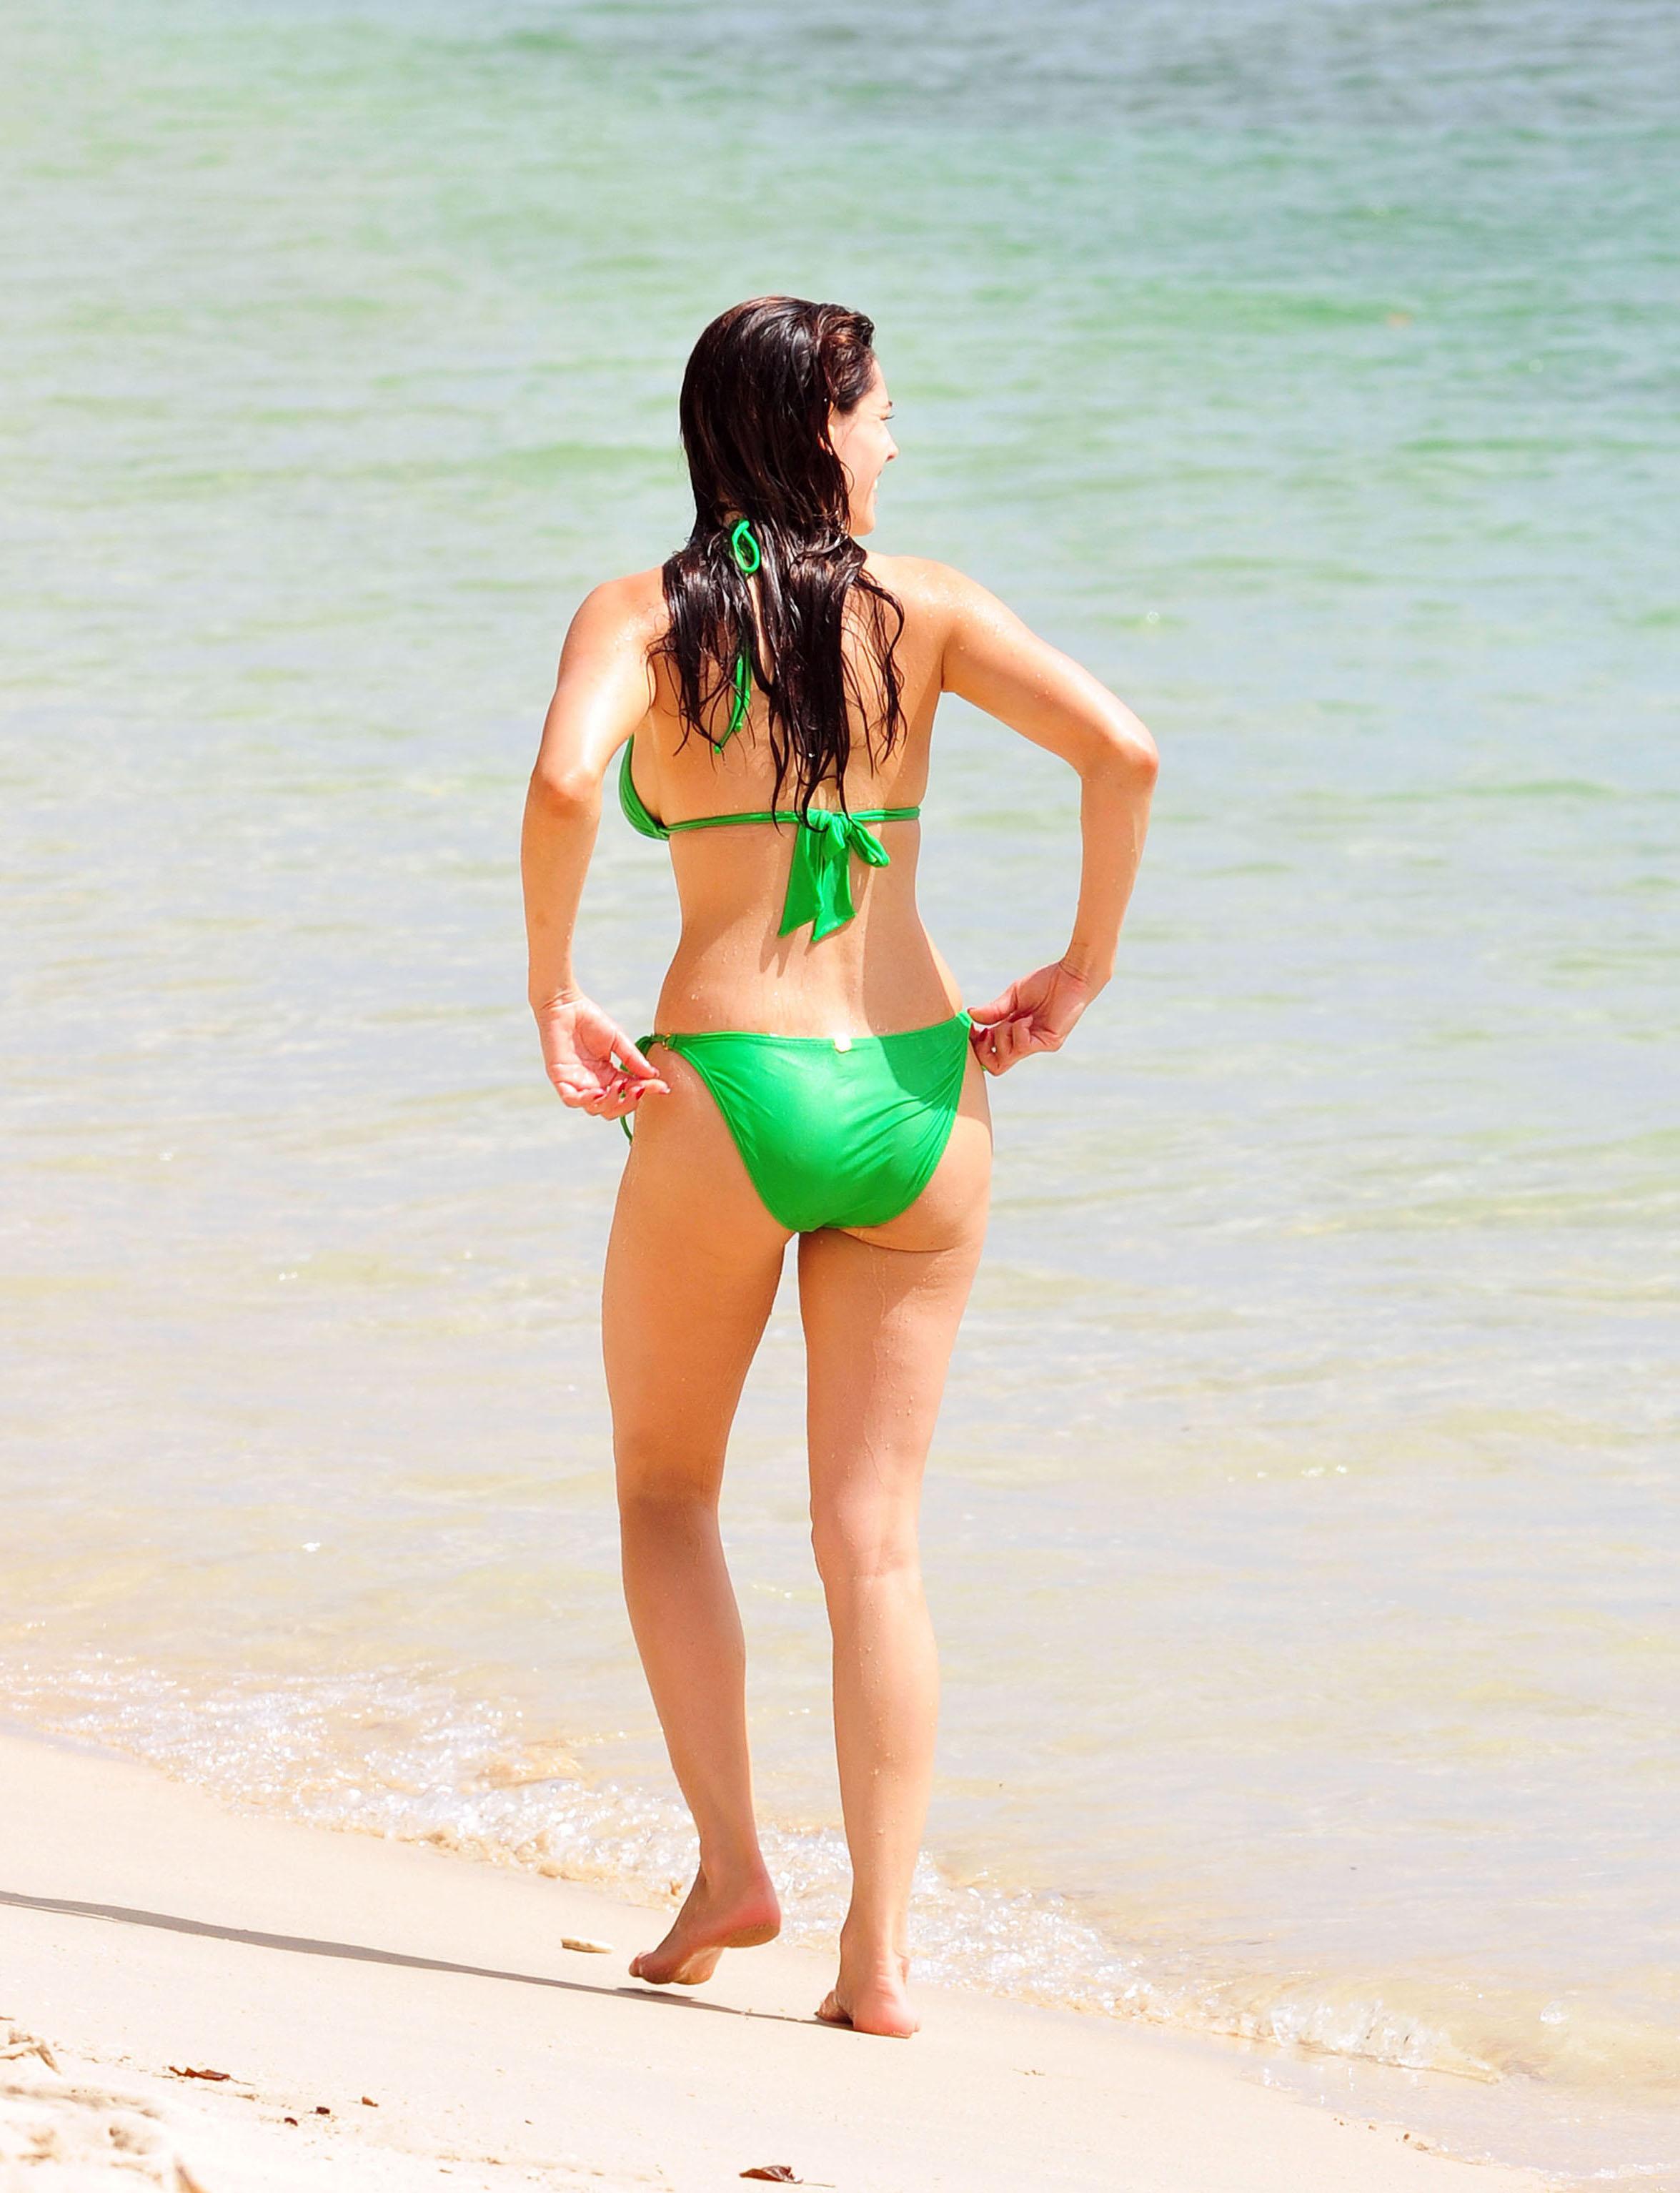 15079_KellyBrook_HolidayintheCaribbean_Green_Bikini12_122_370lo.jpg